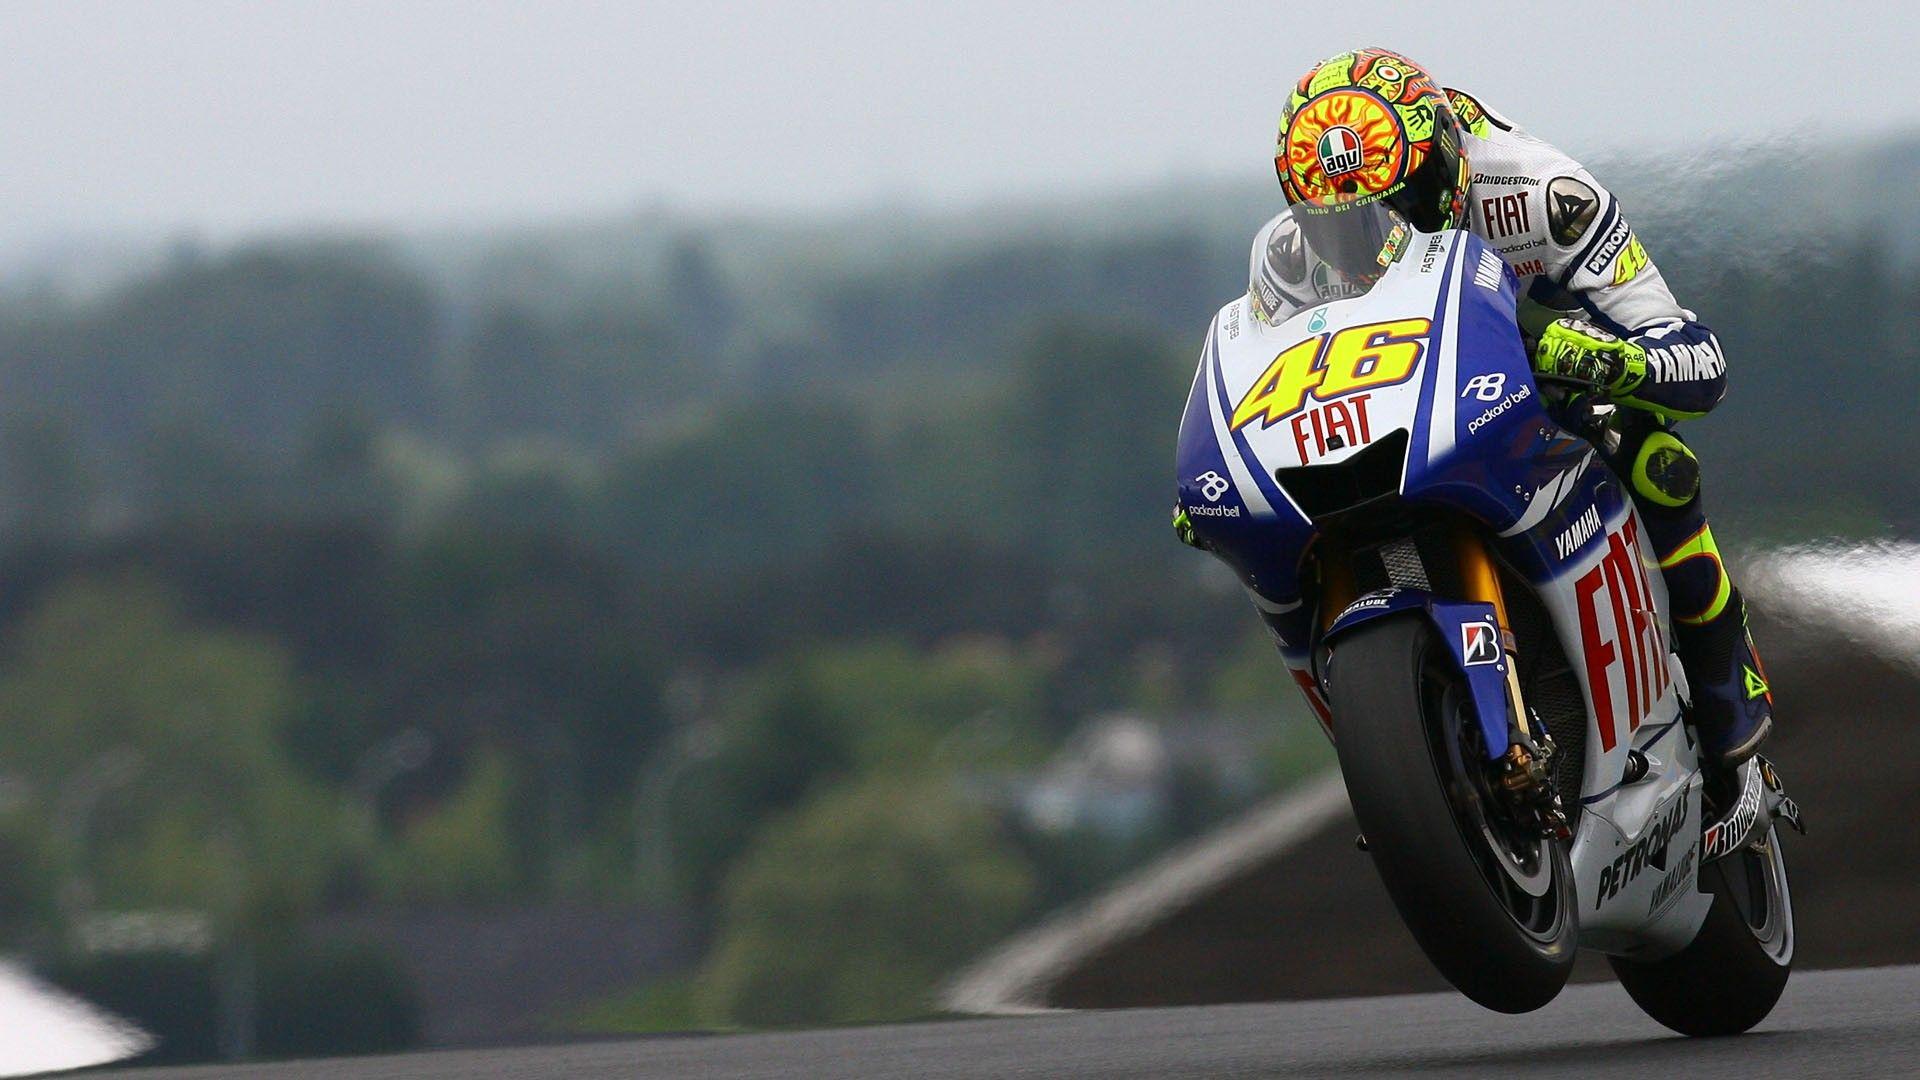 MotoGP Wallpaper HD